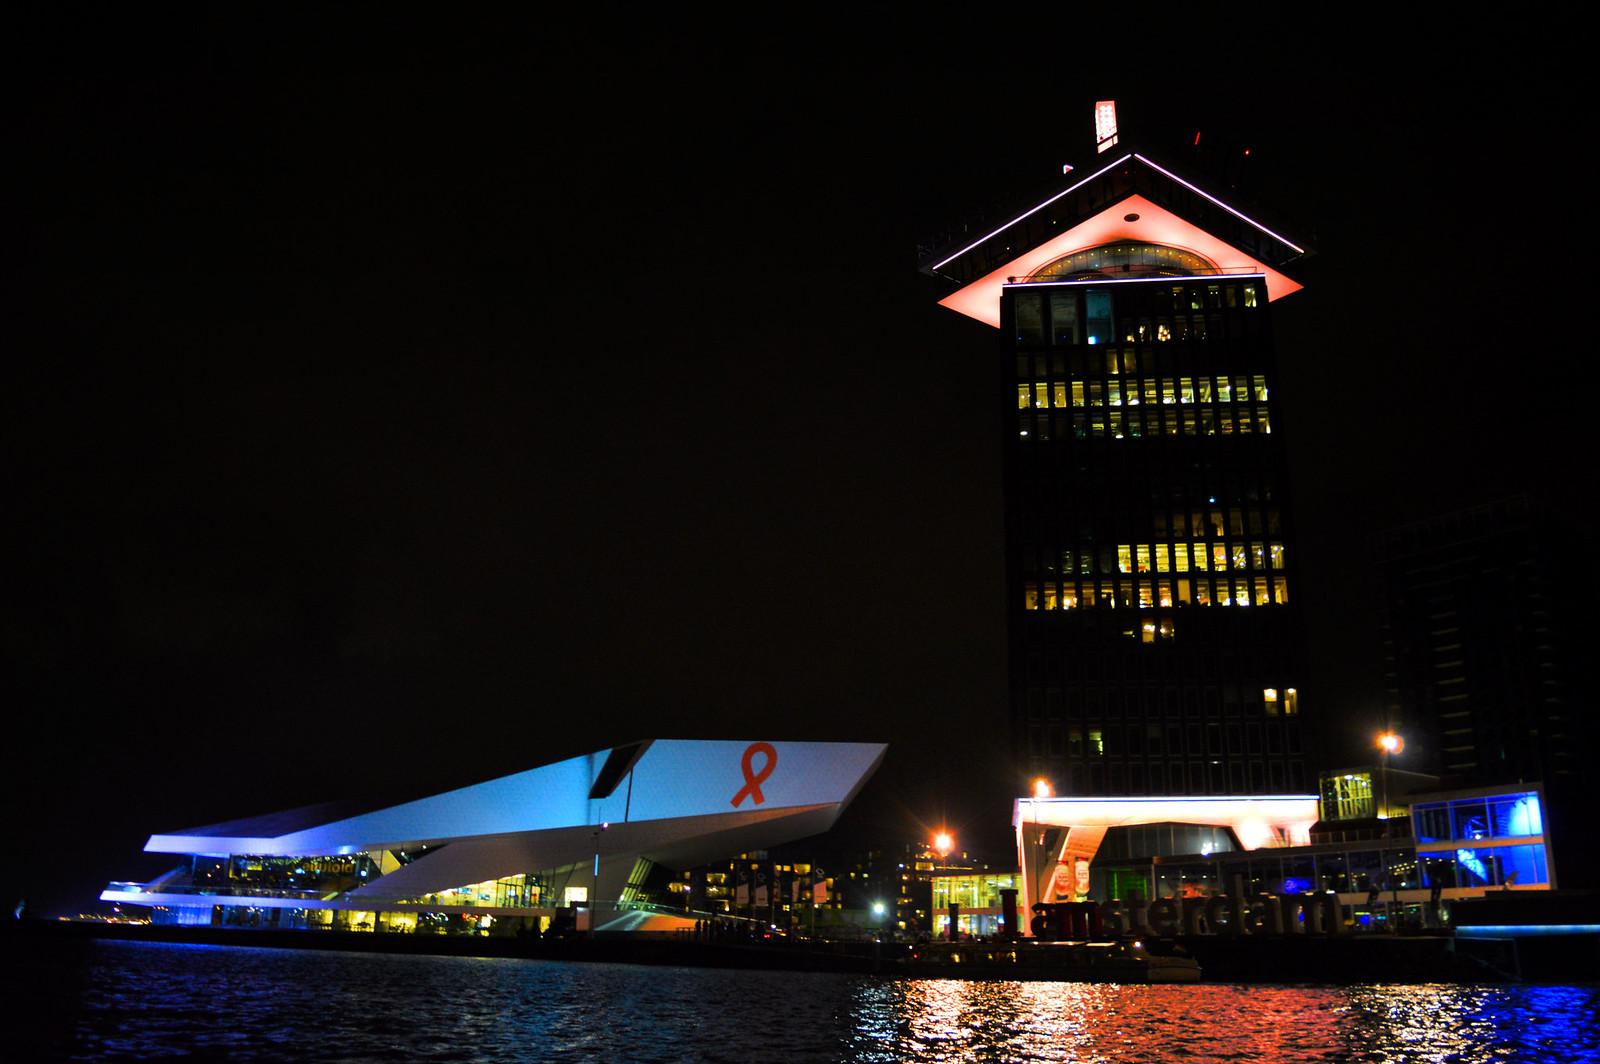 IJpromenade Amsterdam